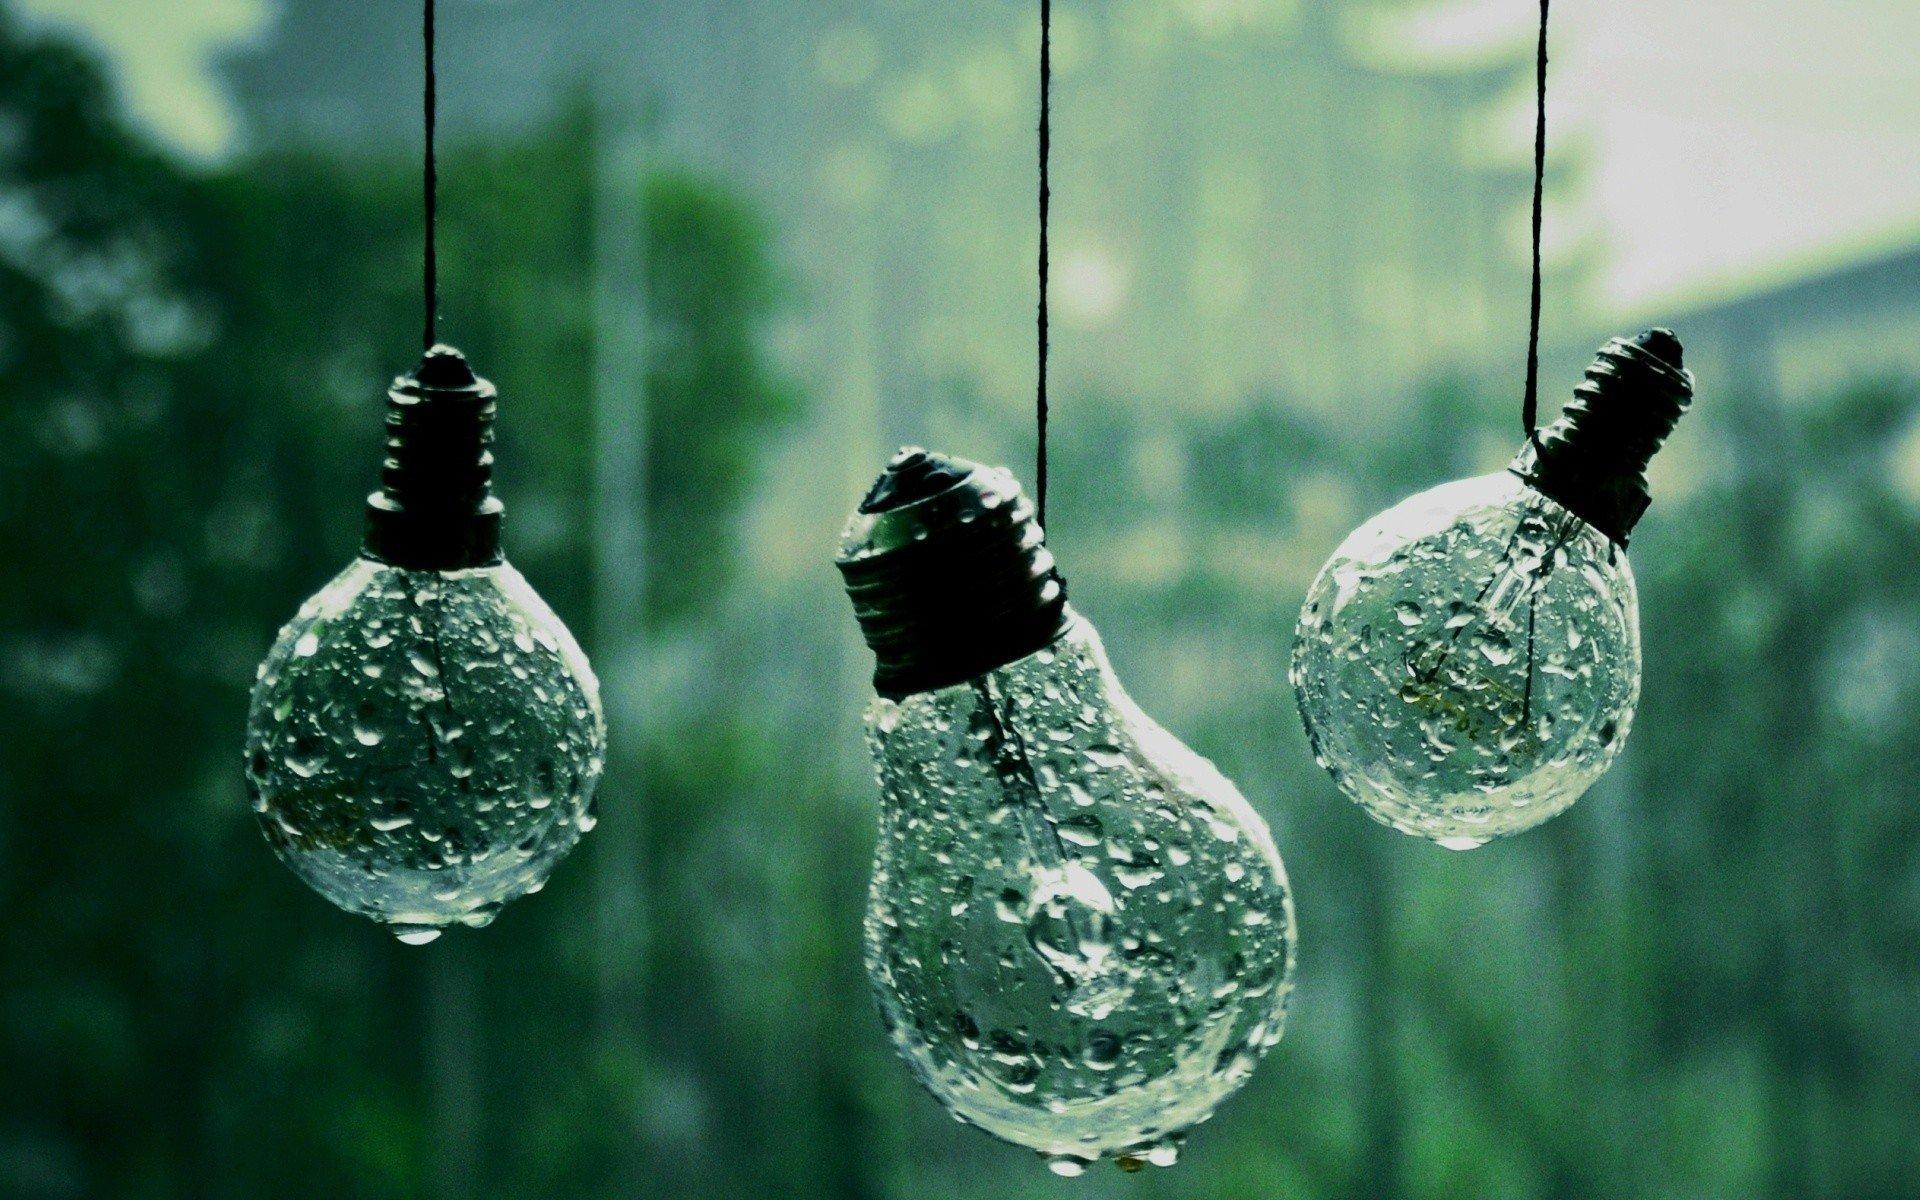 Wallpaper 1920x1200 Px Lightbulb Rain Water Drops 1920x1200 Images, Photos, Reviews